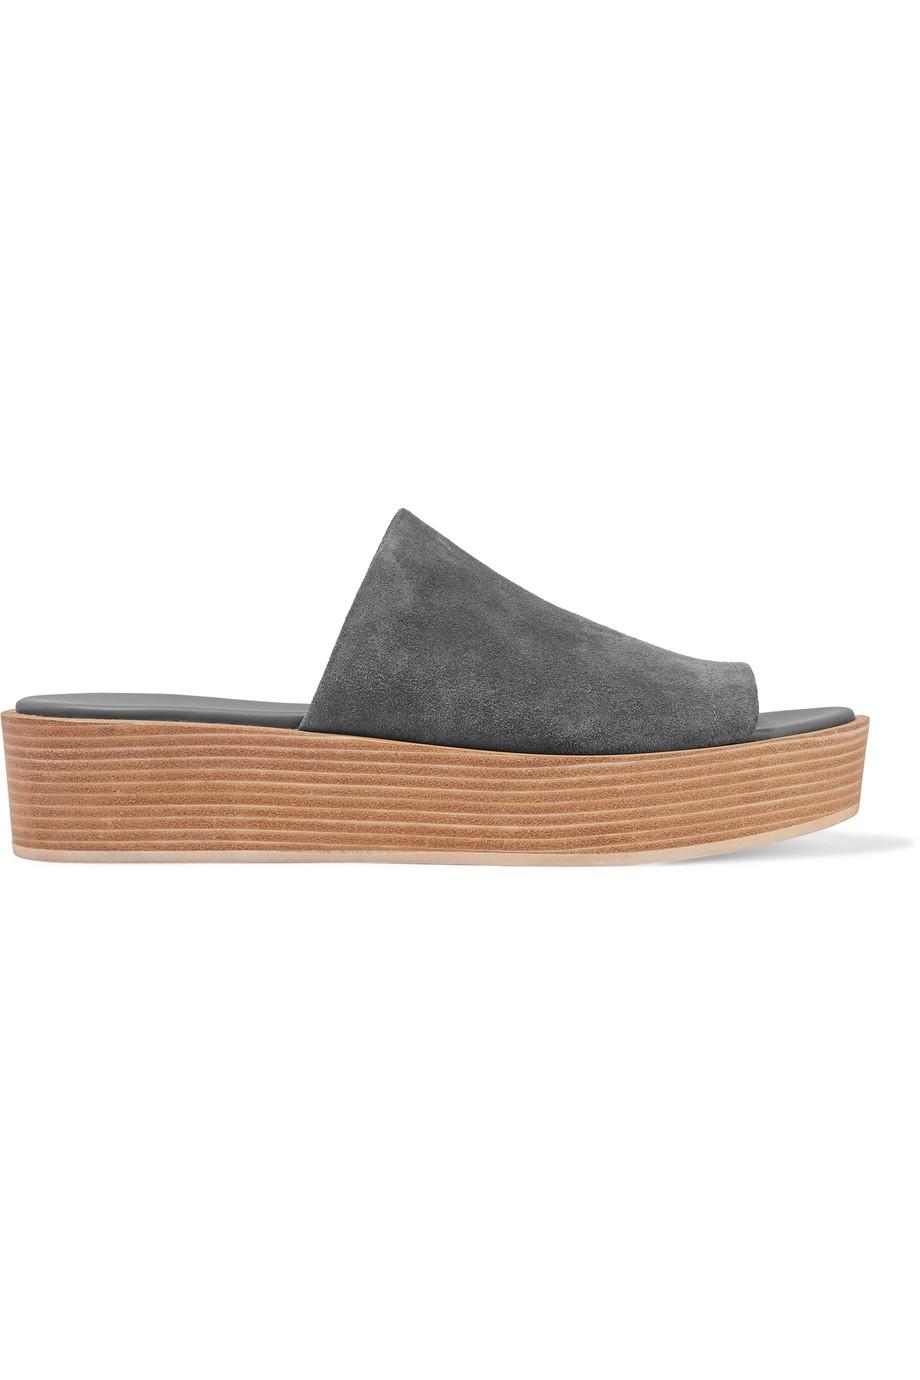 VINCE Saskia Suede Sandals at THE OUTNET.COM